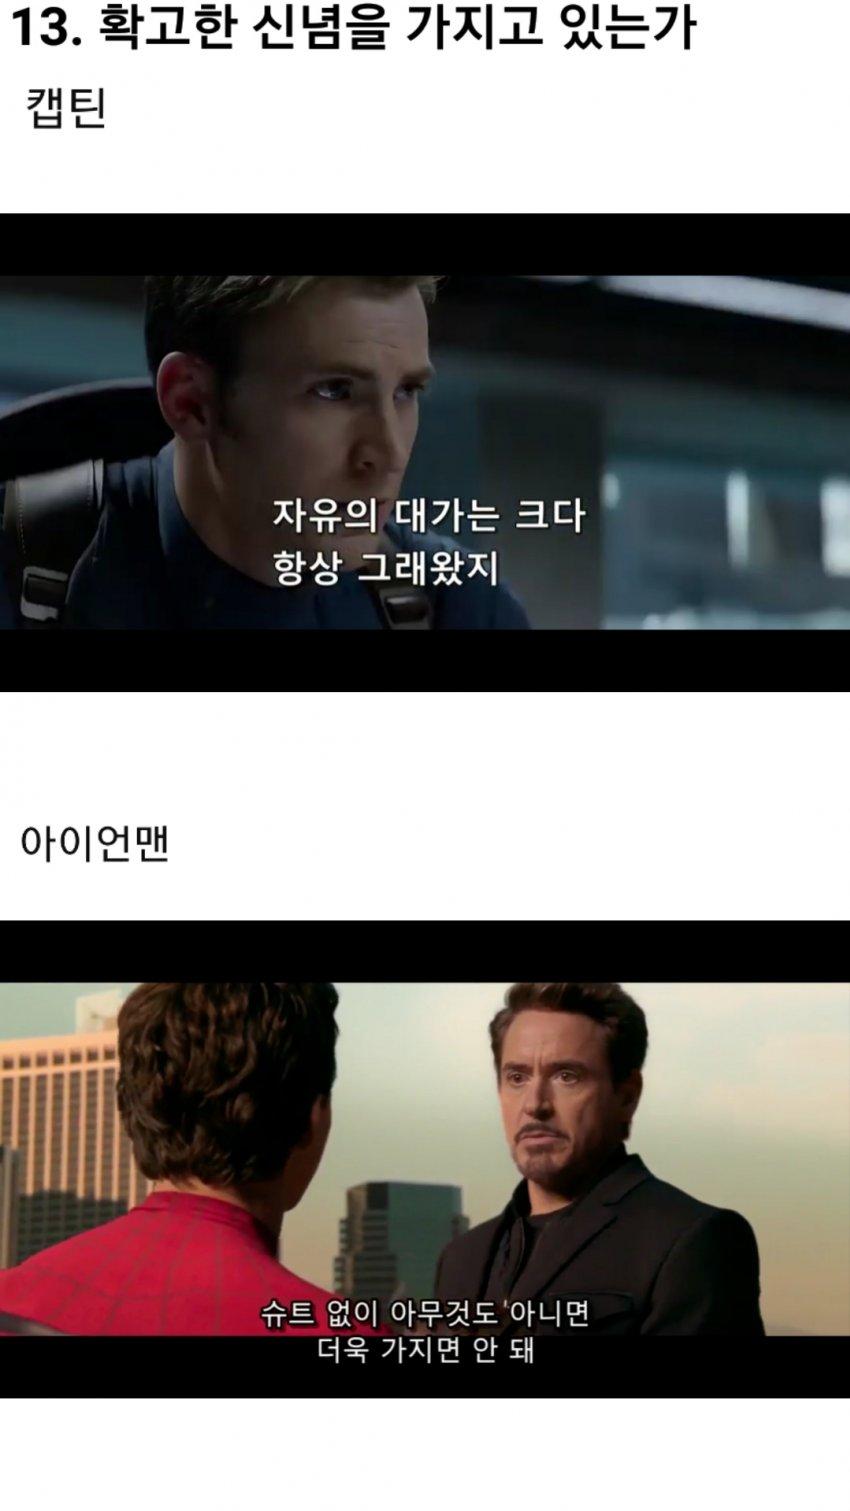 viewimage.php?no=24b0d769e1d32ca73dec8efa11d02831b210072811d995369f4ff09c9cd74d83de486eb29f060883b48016e0563d78fecb4e402a23099558bfb2416e92a4bb1075972515550cfbd8ab32620a77fe82dc832adb3f